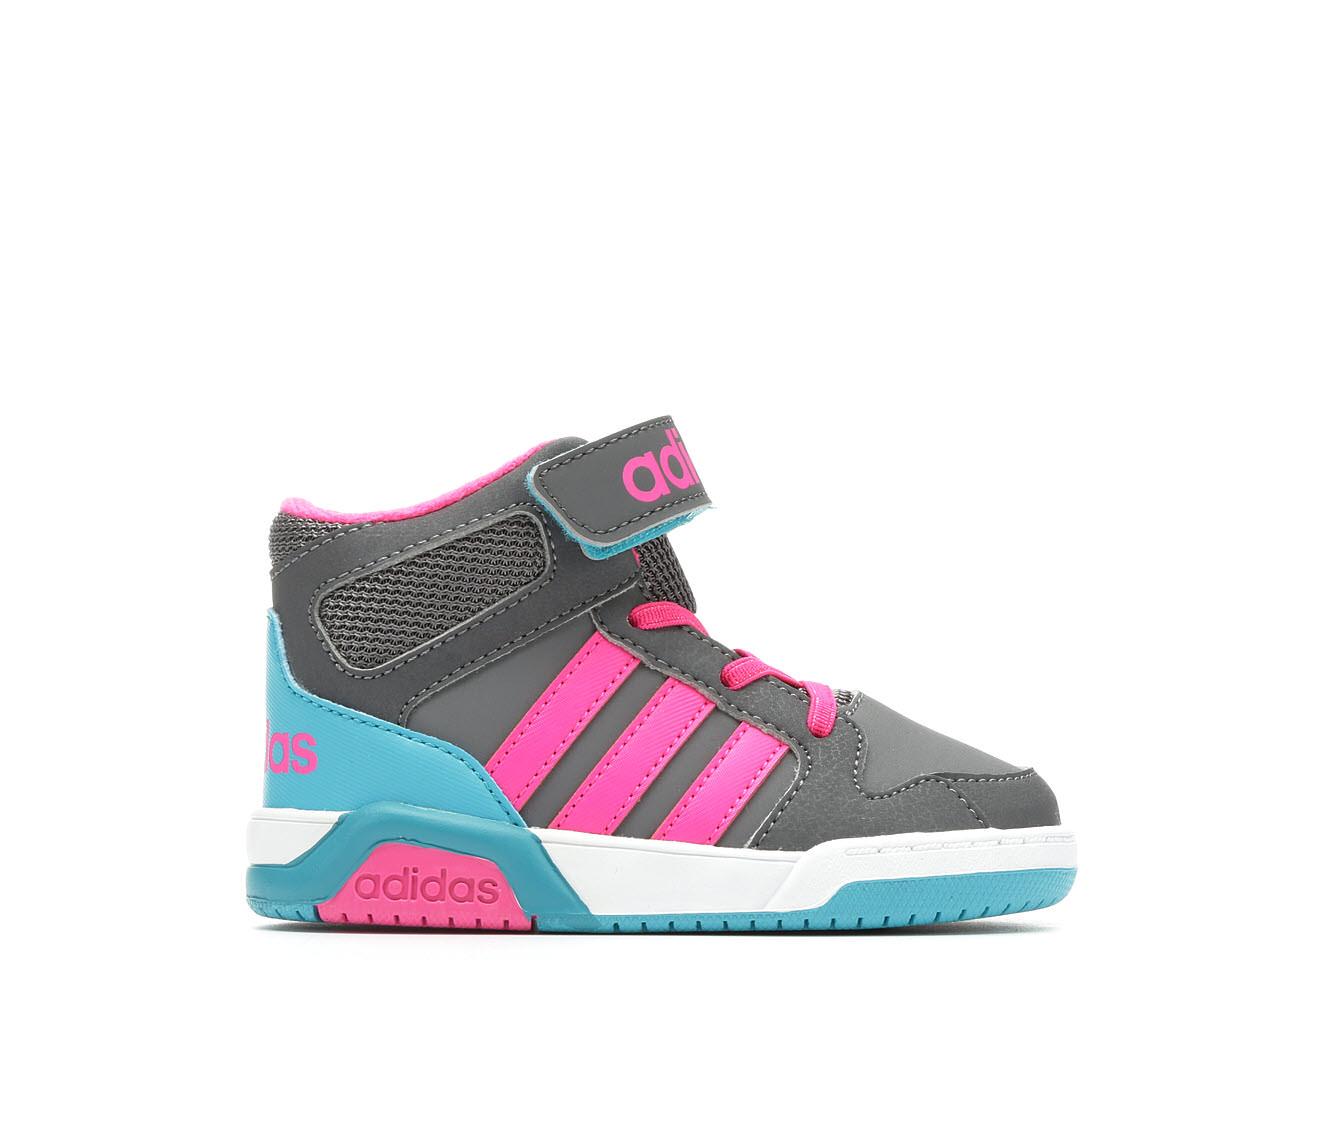 Girls' Adidas Infant BB9TIS Sneakers (Grey)